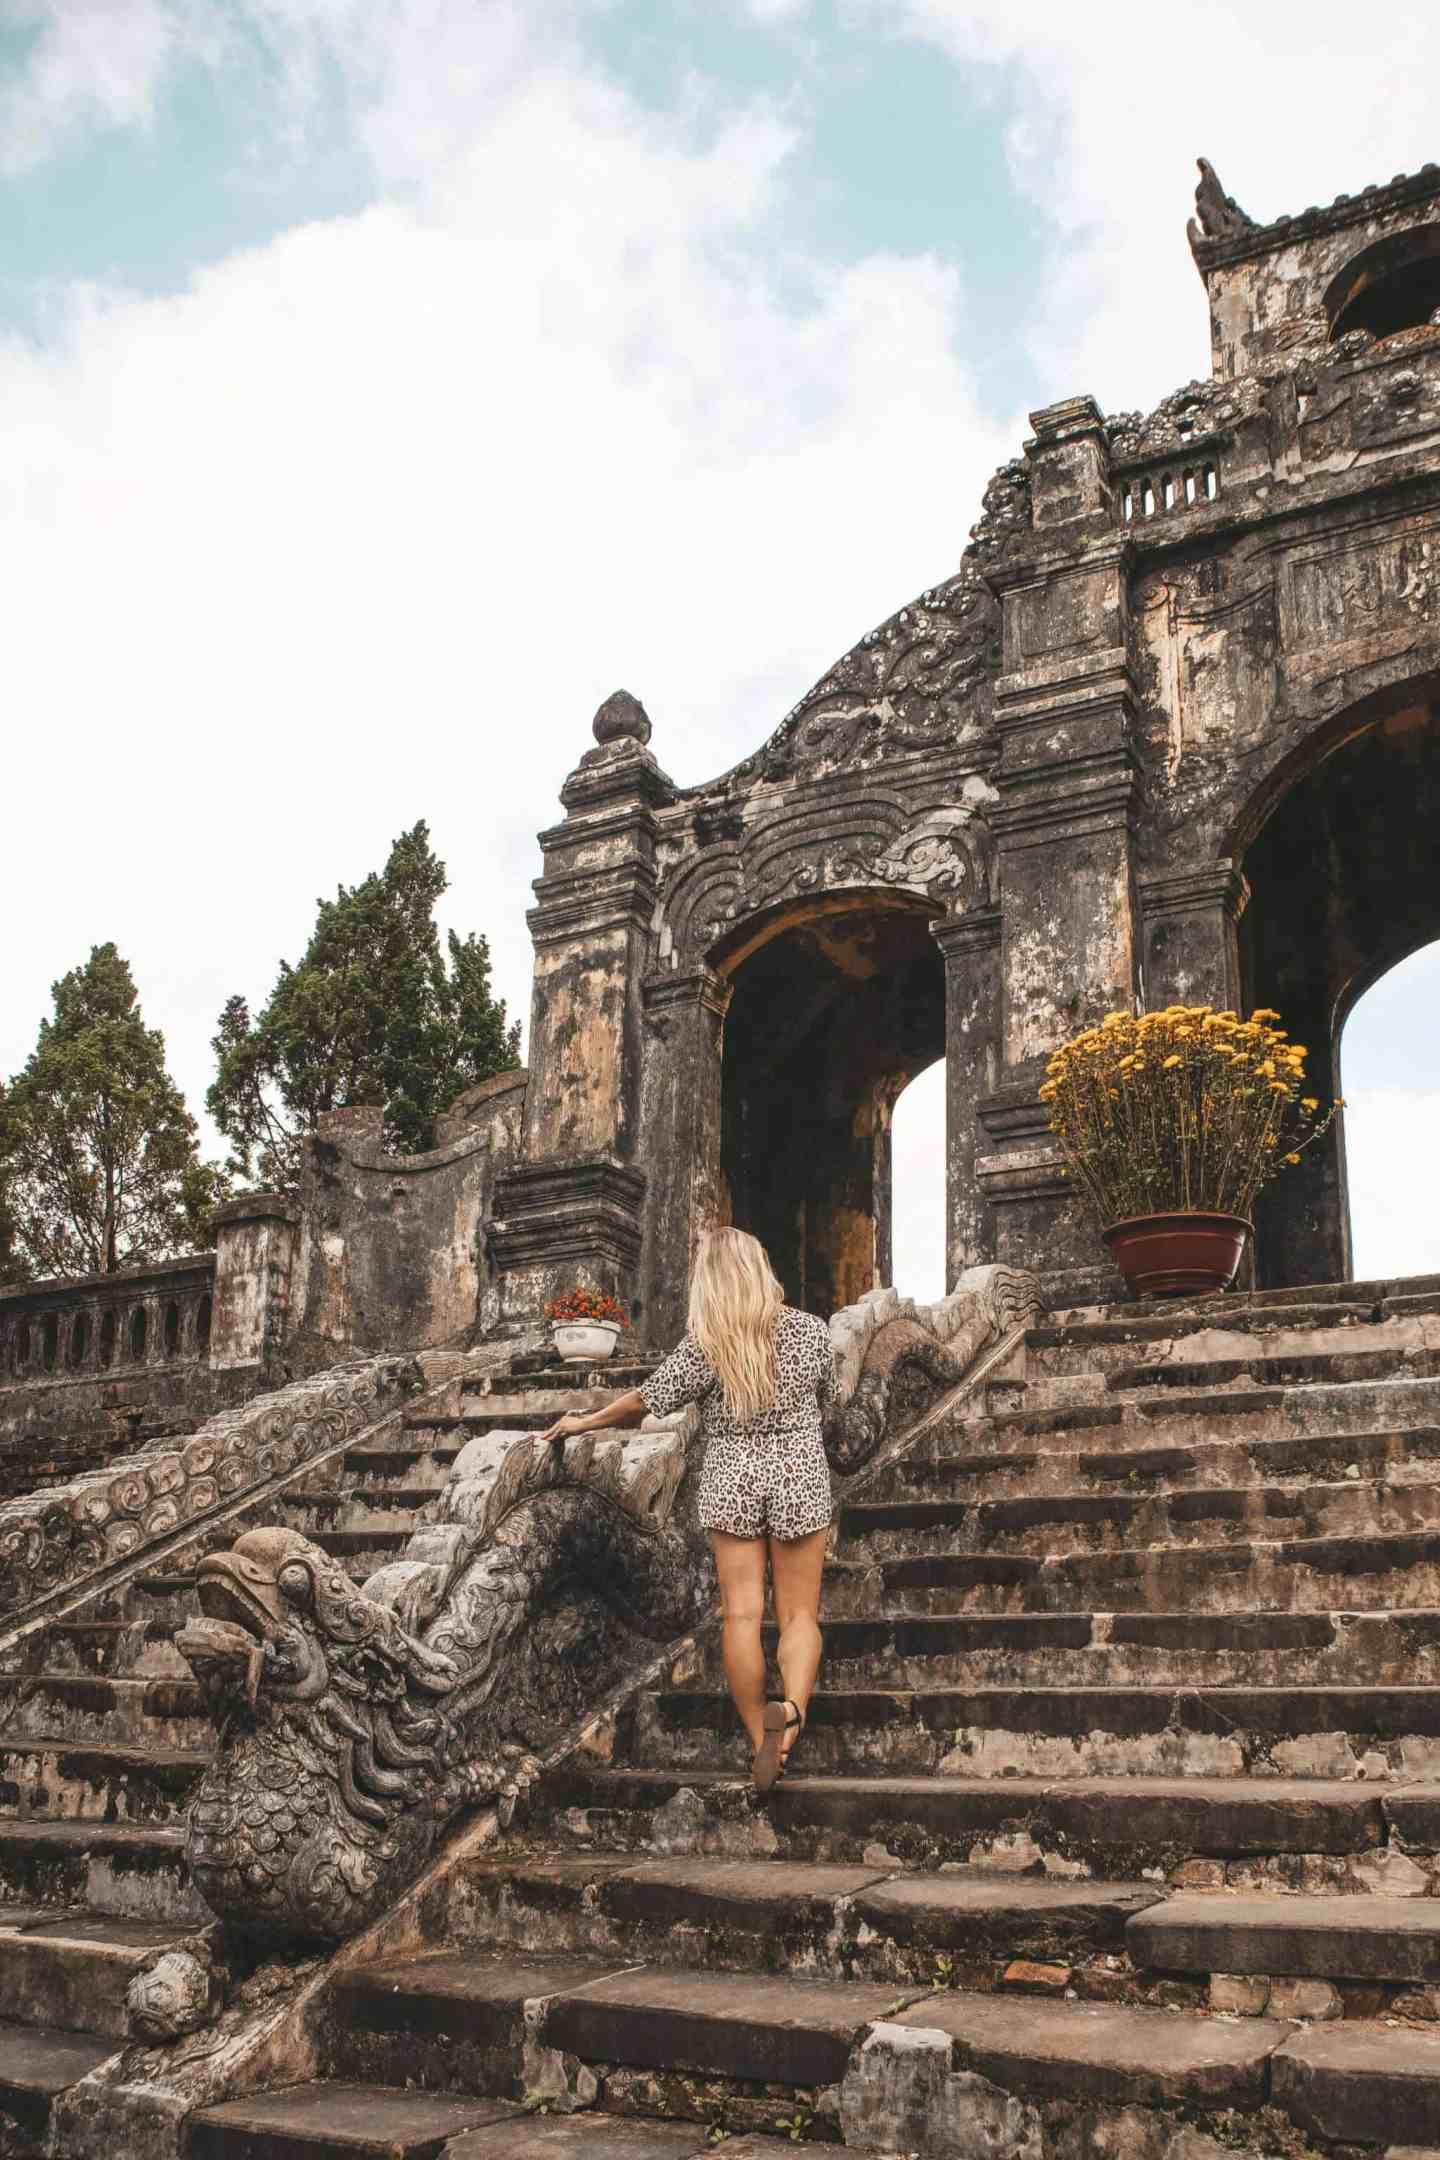 Thailand or Vietnam - Hue